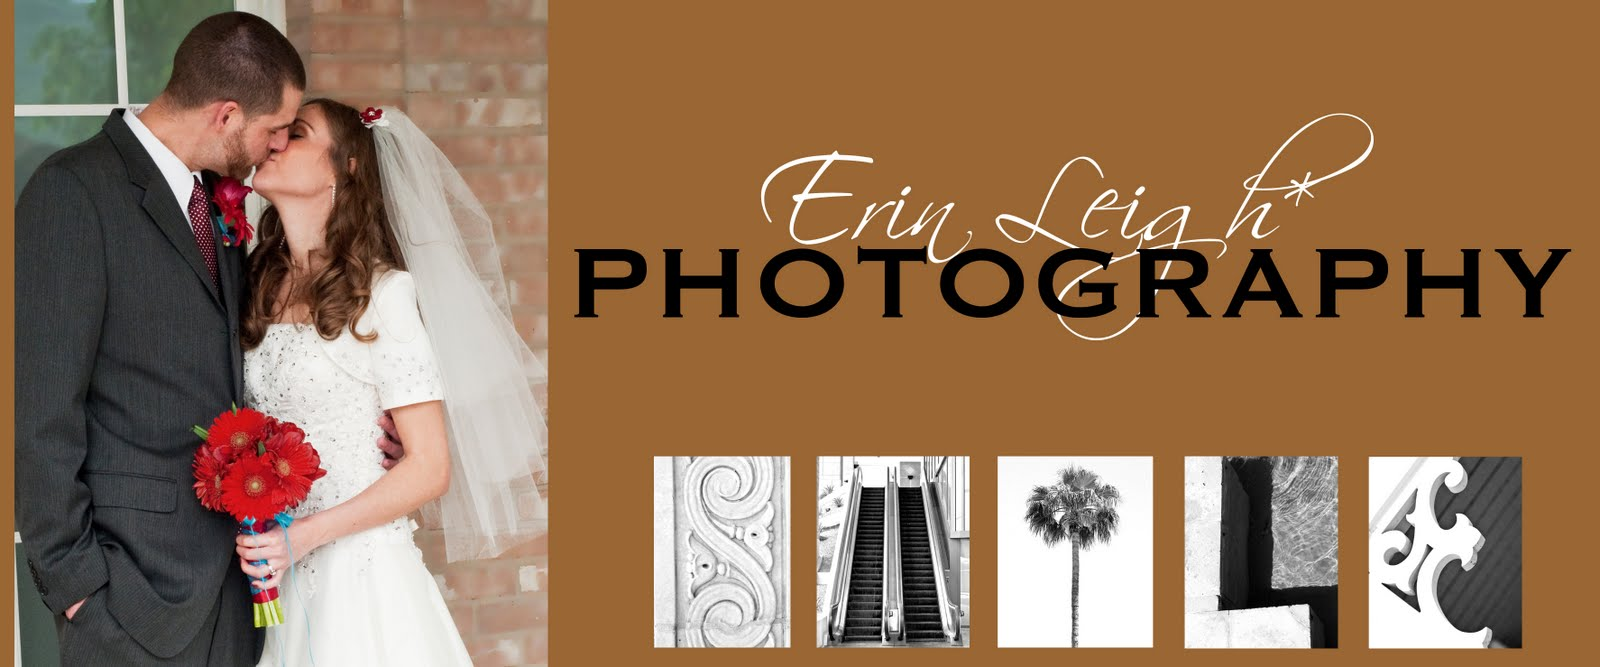 Erin Leigh Photography